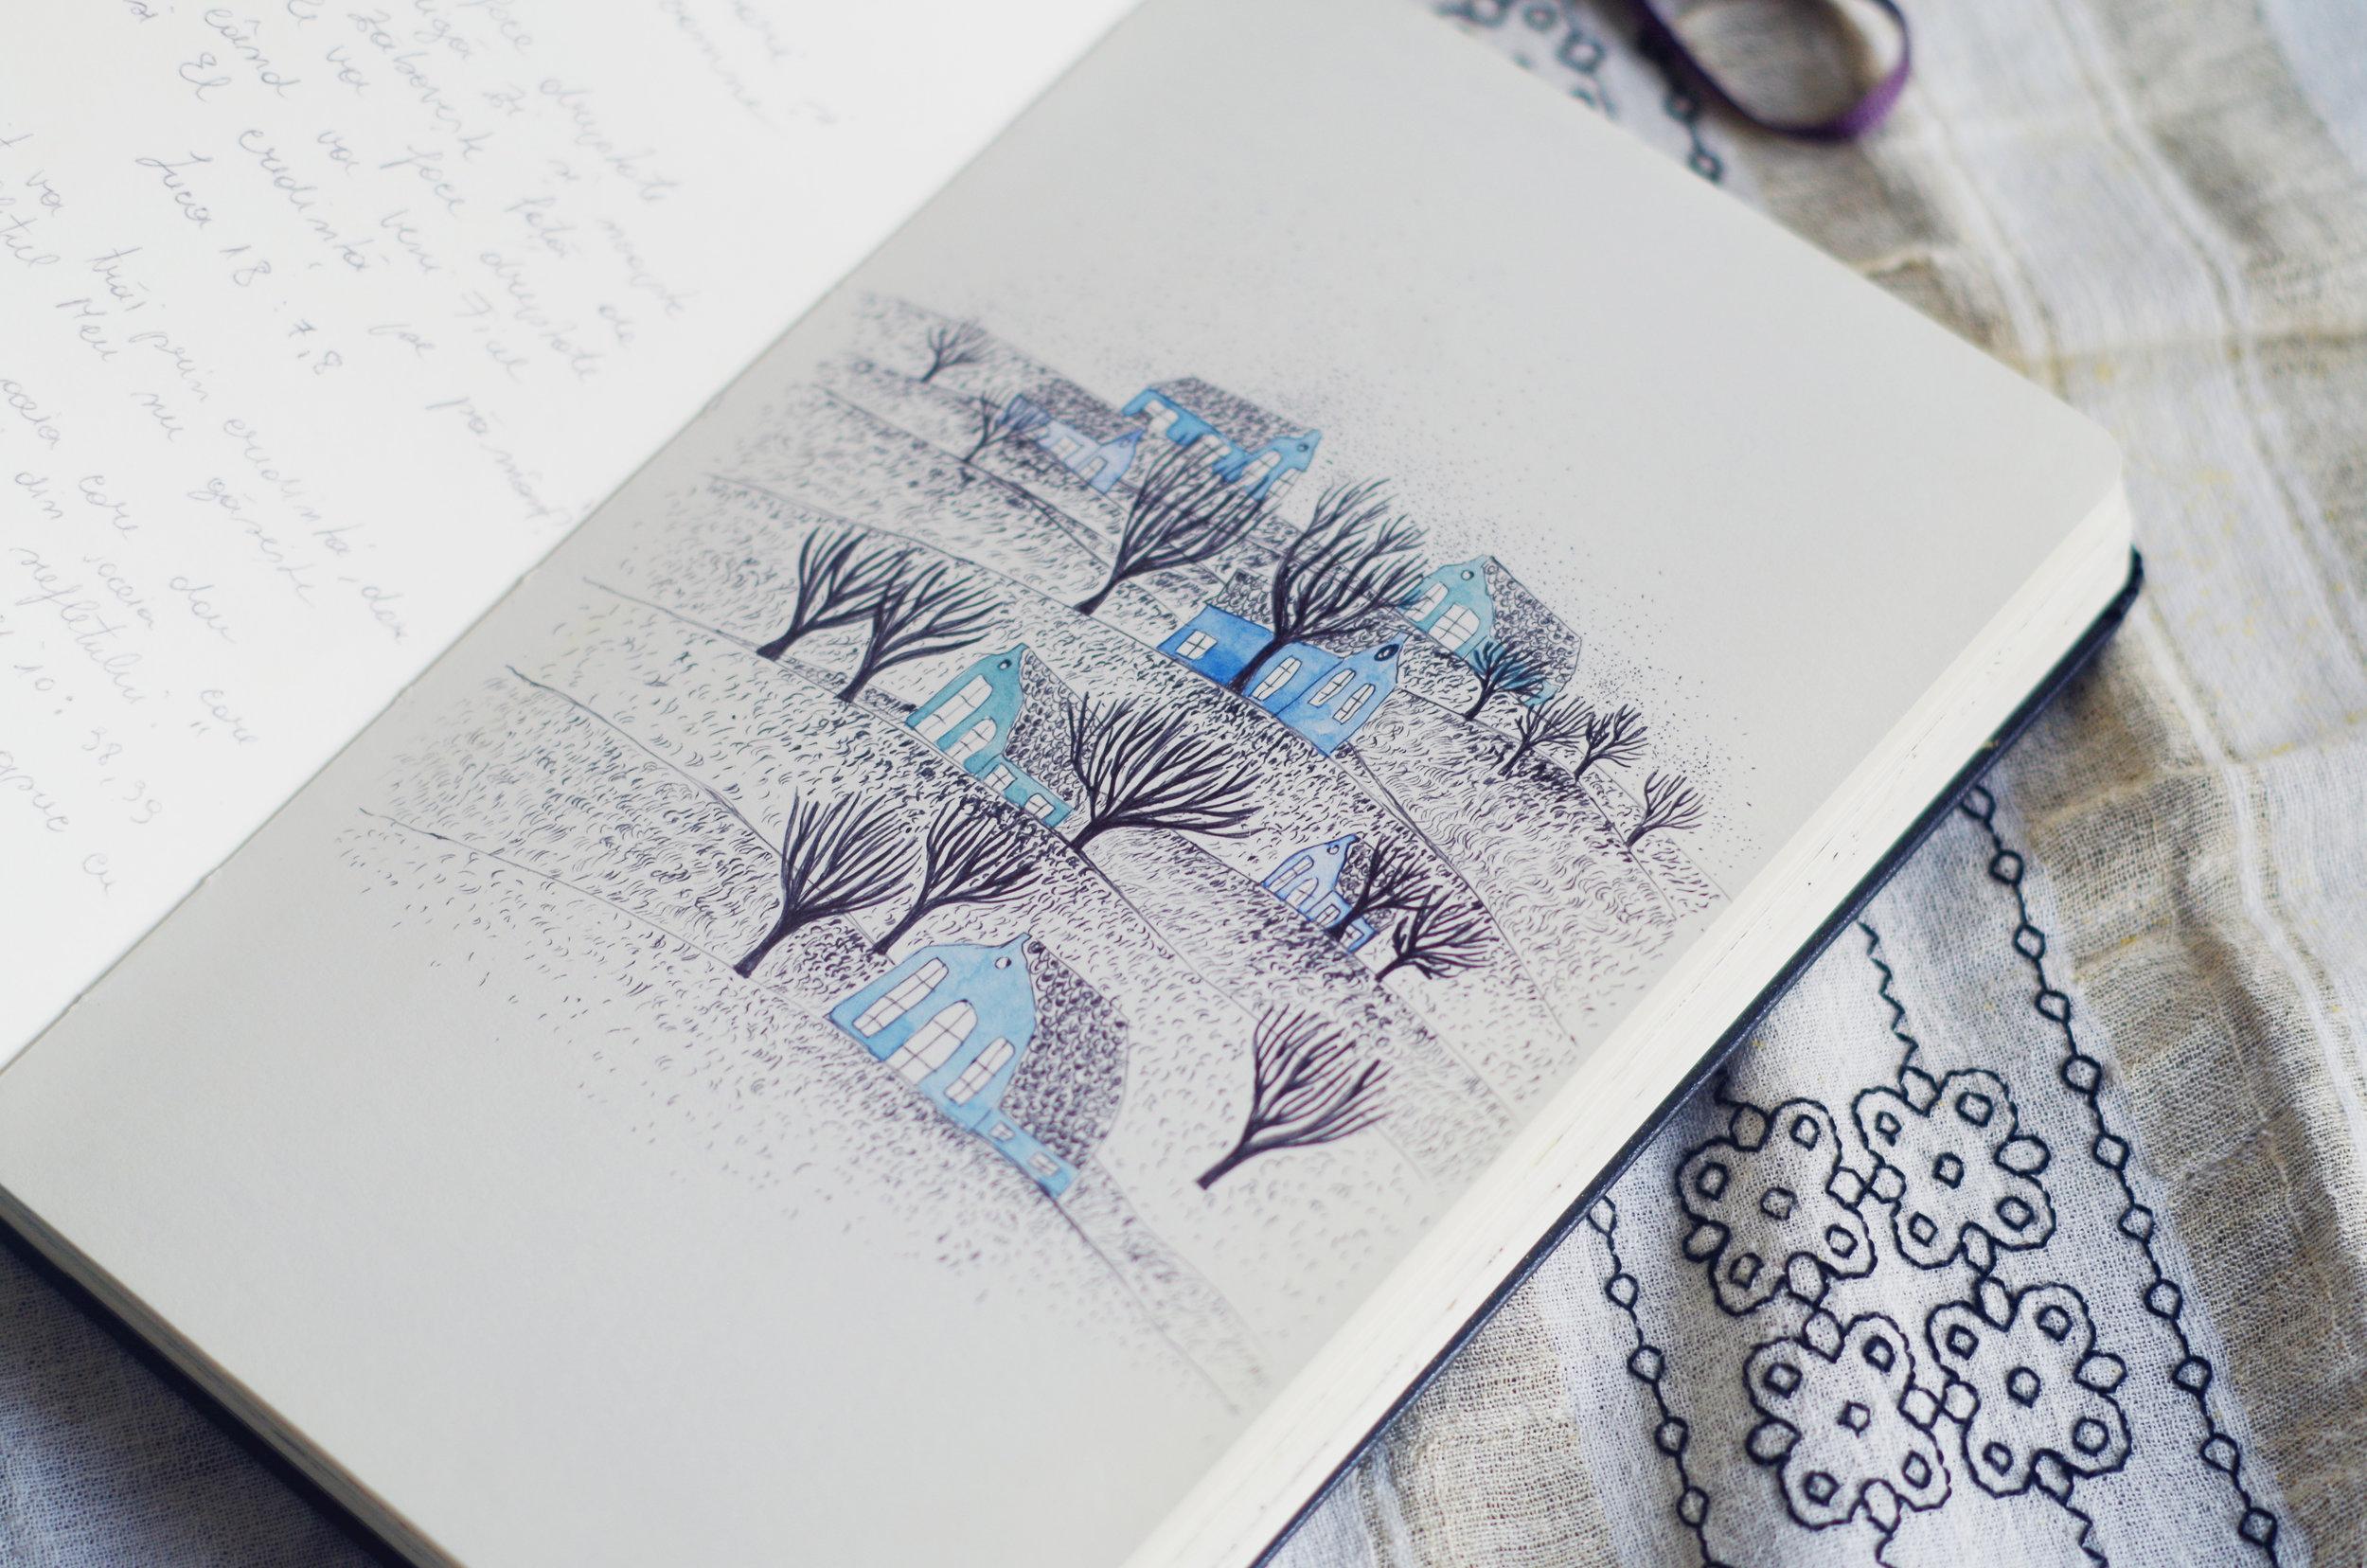 7visualdiary_janina_bourosu_illustration.jpg